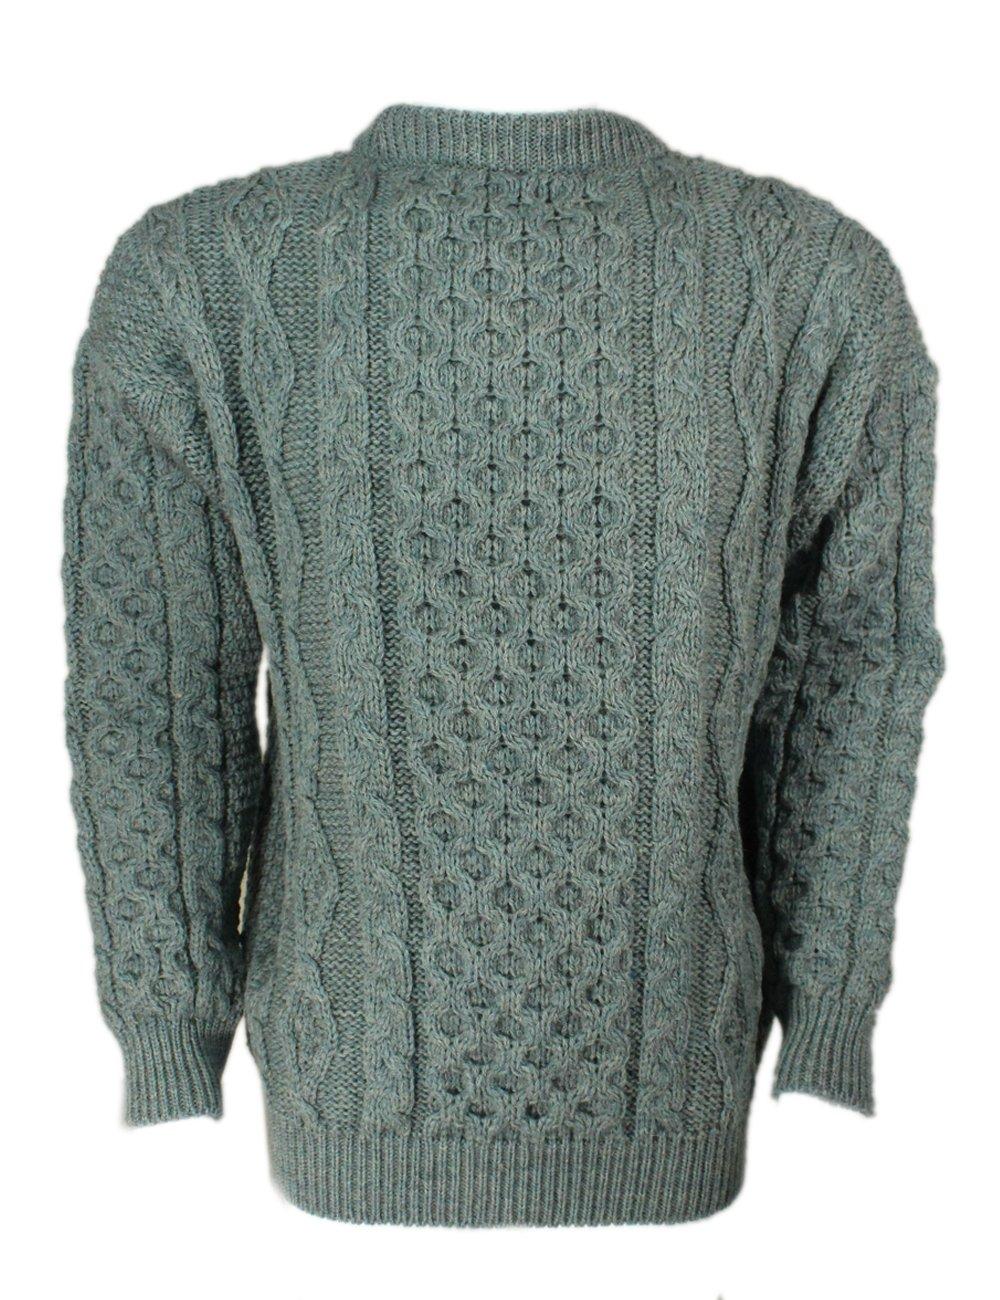 Kerry Woollen Mills Aran Sweater Summer Storm 100% Wool Irish Made Large